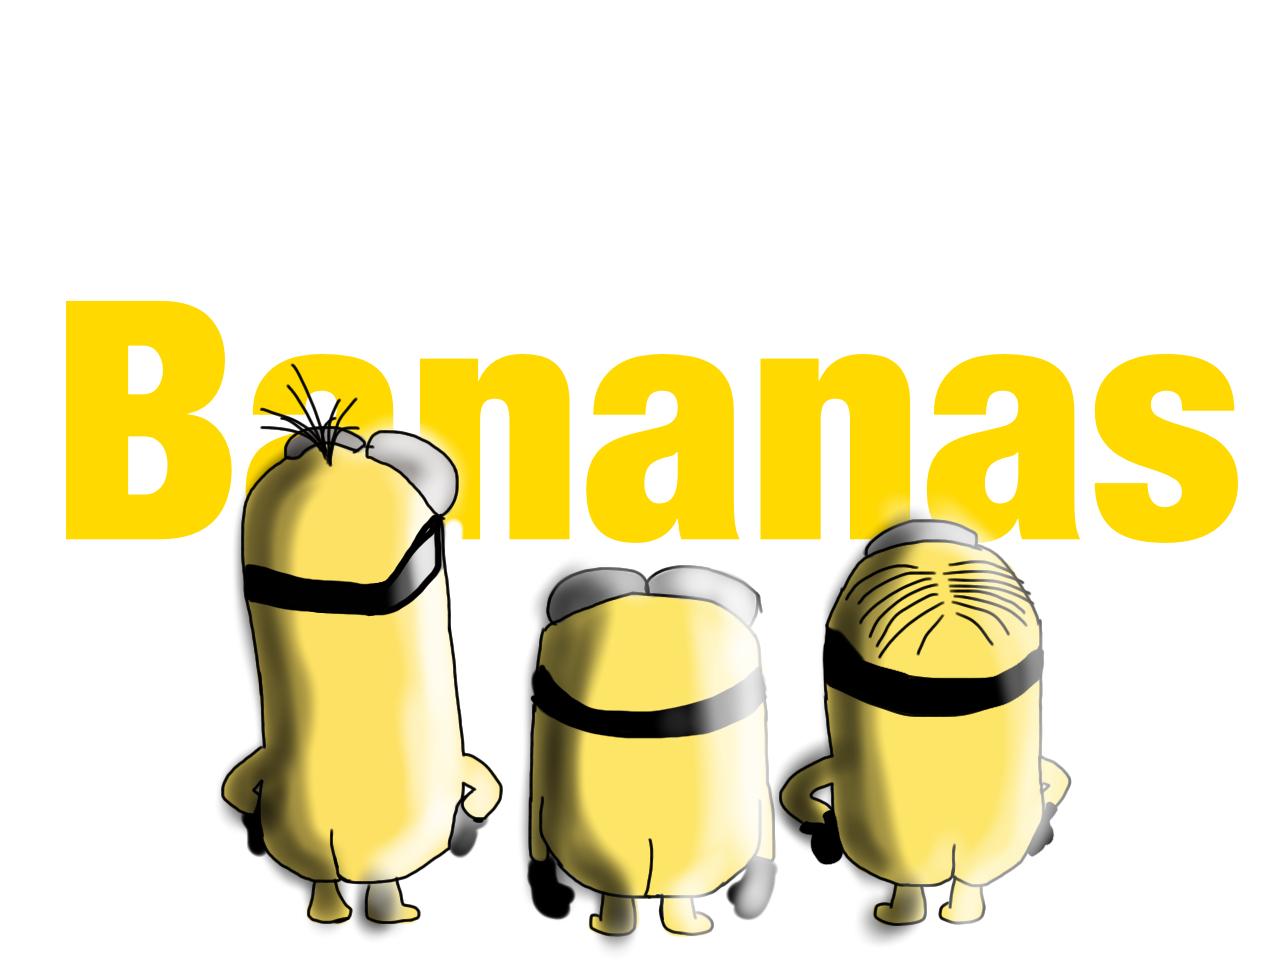 Minions Bananas by MoreFox on DeviantArt